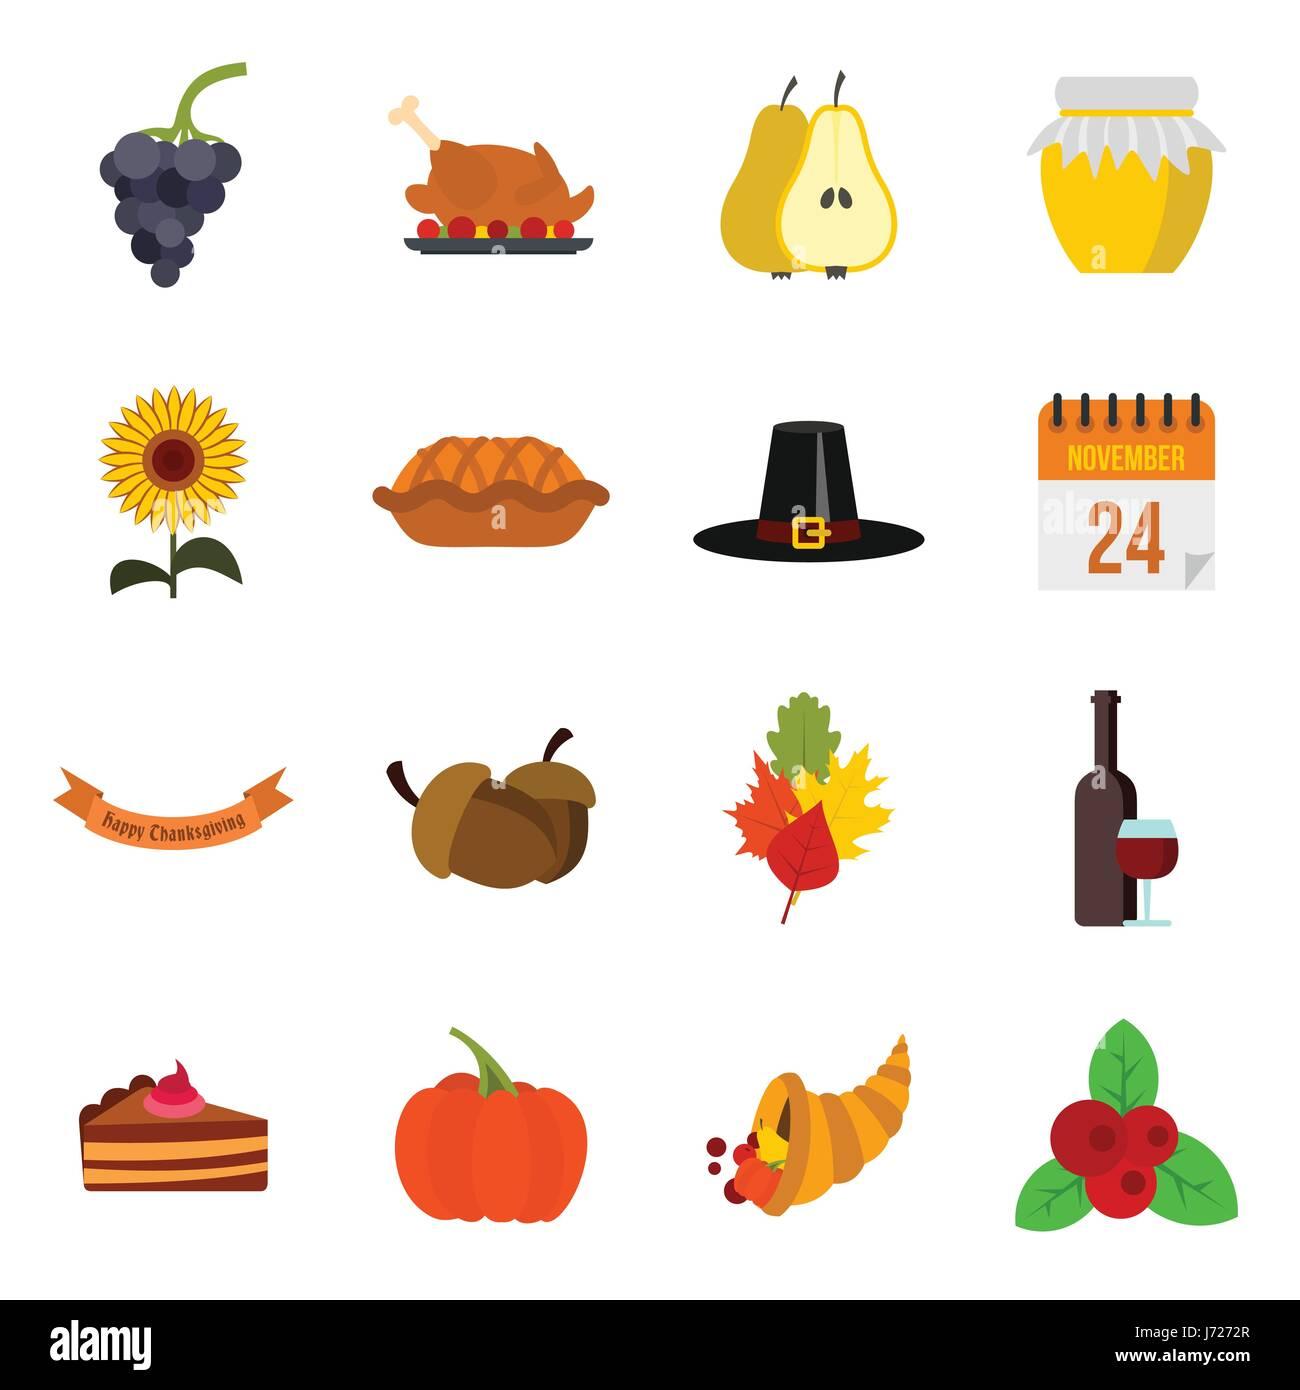 Thanksgiving Icons Set Flat Style Stock Vector Art